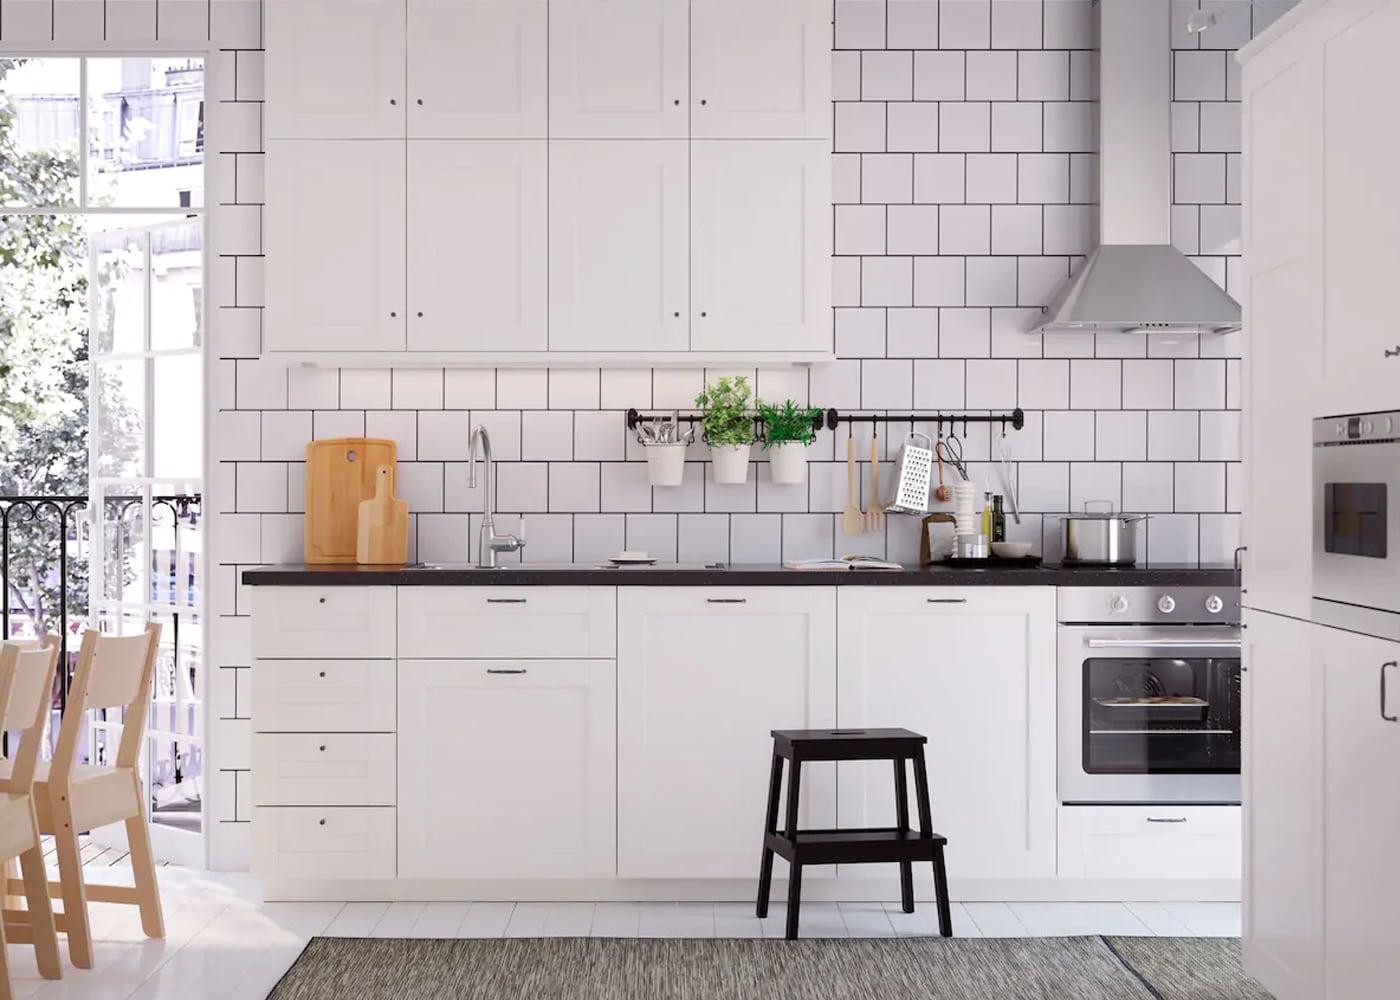 die wei geliebte k che ikea ikea. Black Bedroom Furniture Sets. Home Design Ideas